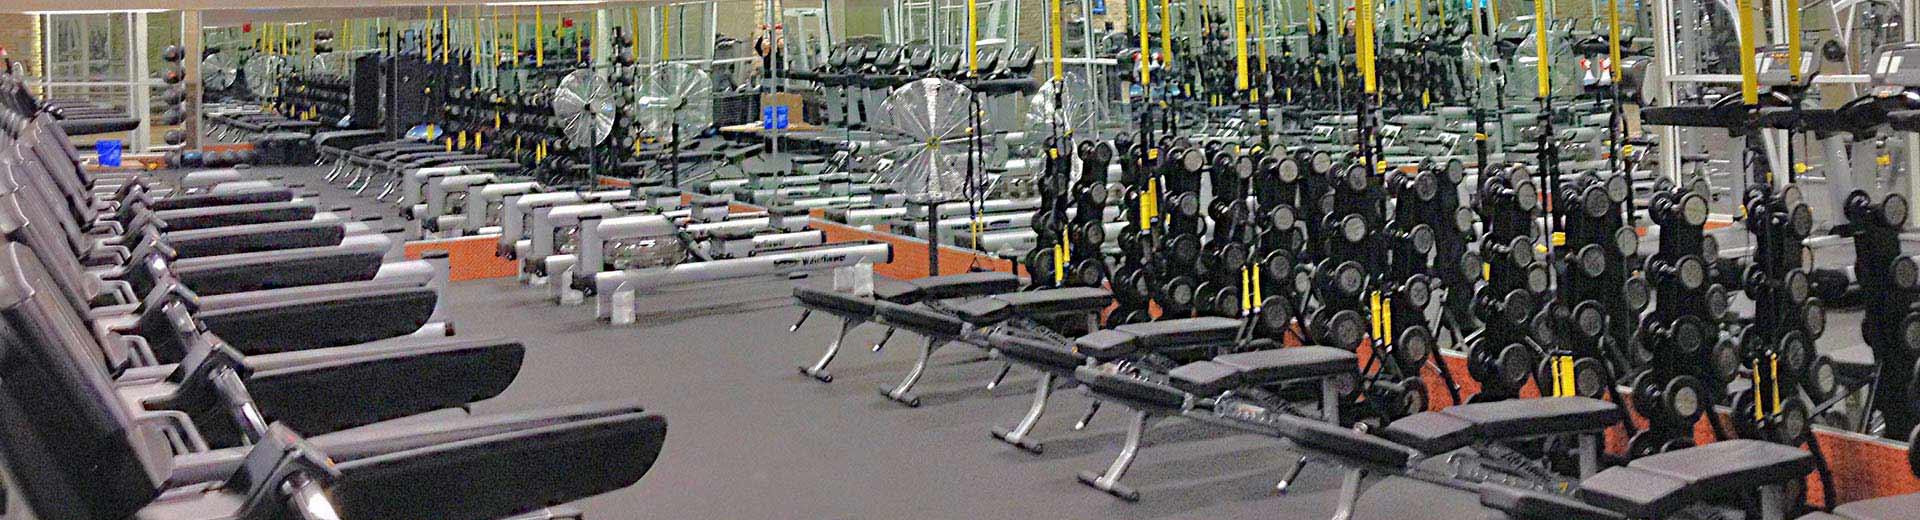 alexandria virginia gym amenities